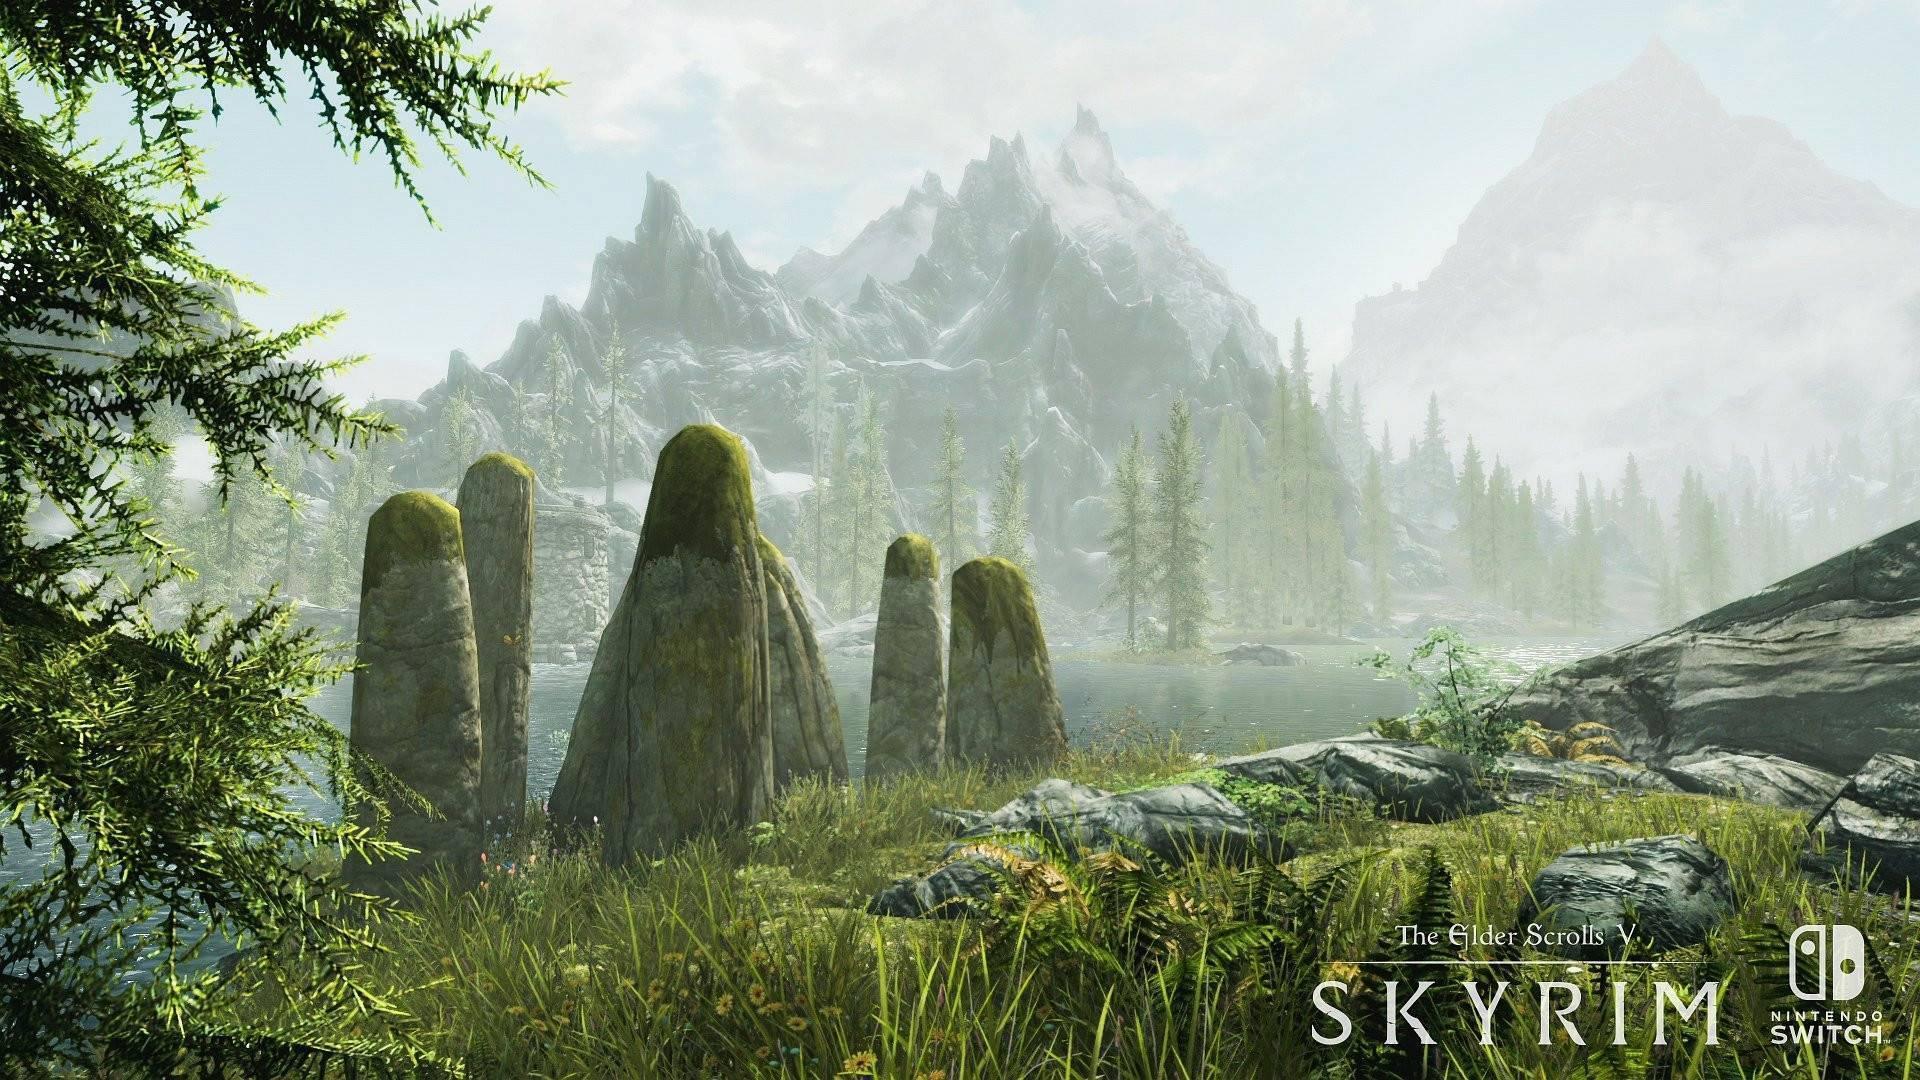 Buy The Elder Scrolls V: Skyrim Nintendo Switch - compare prices